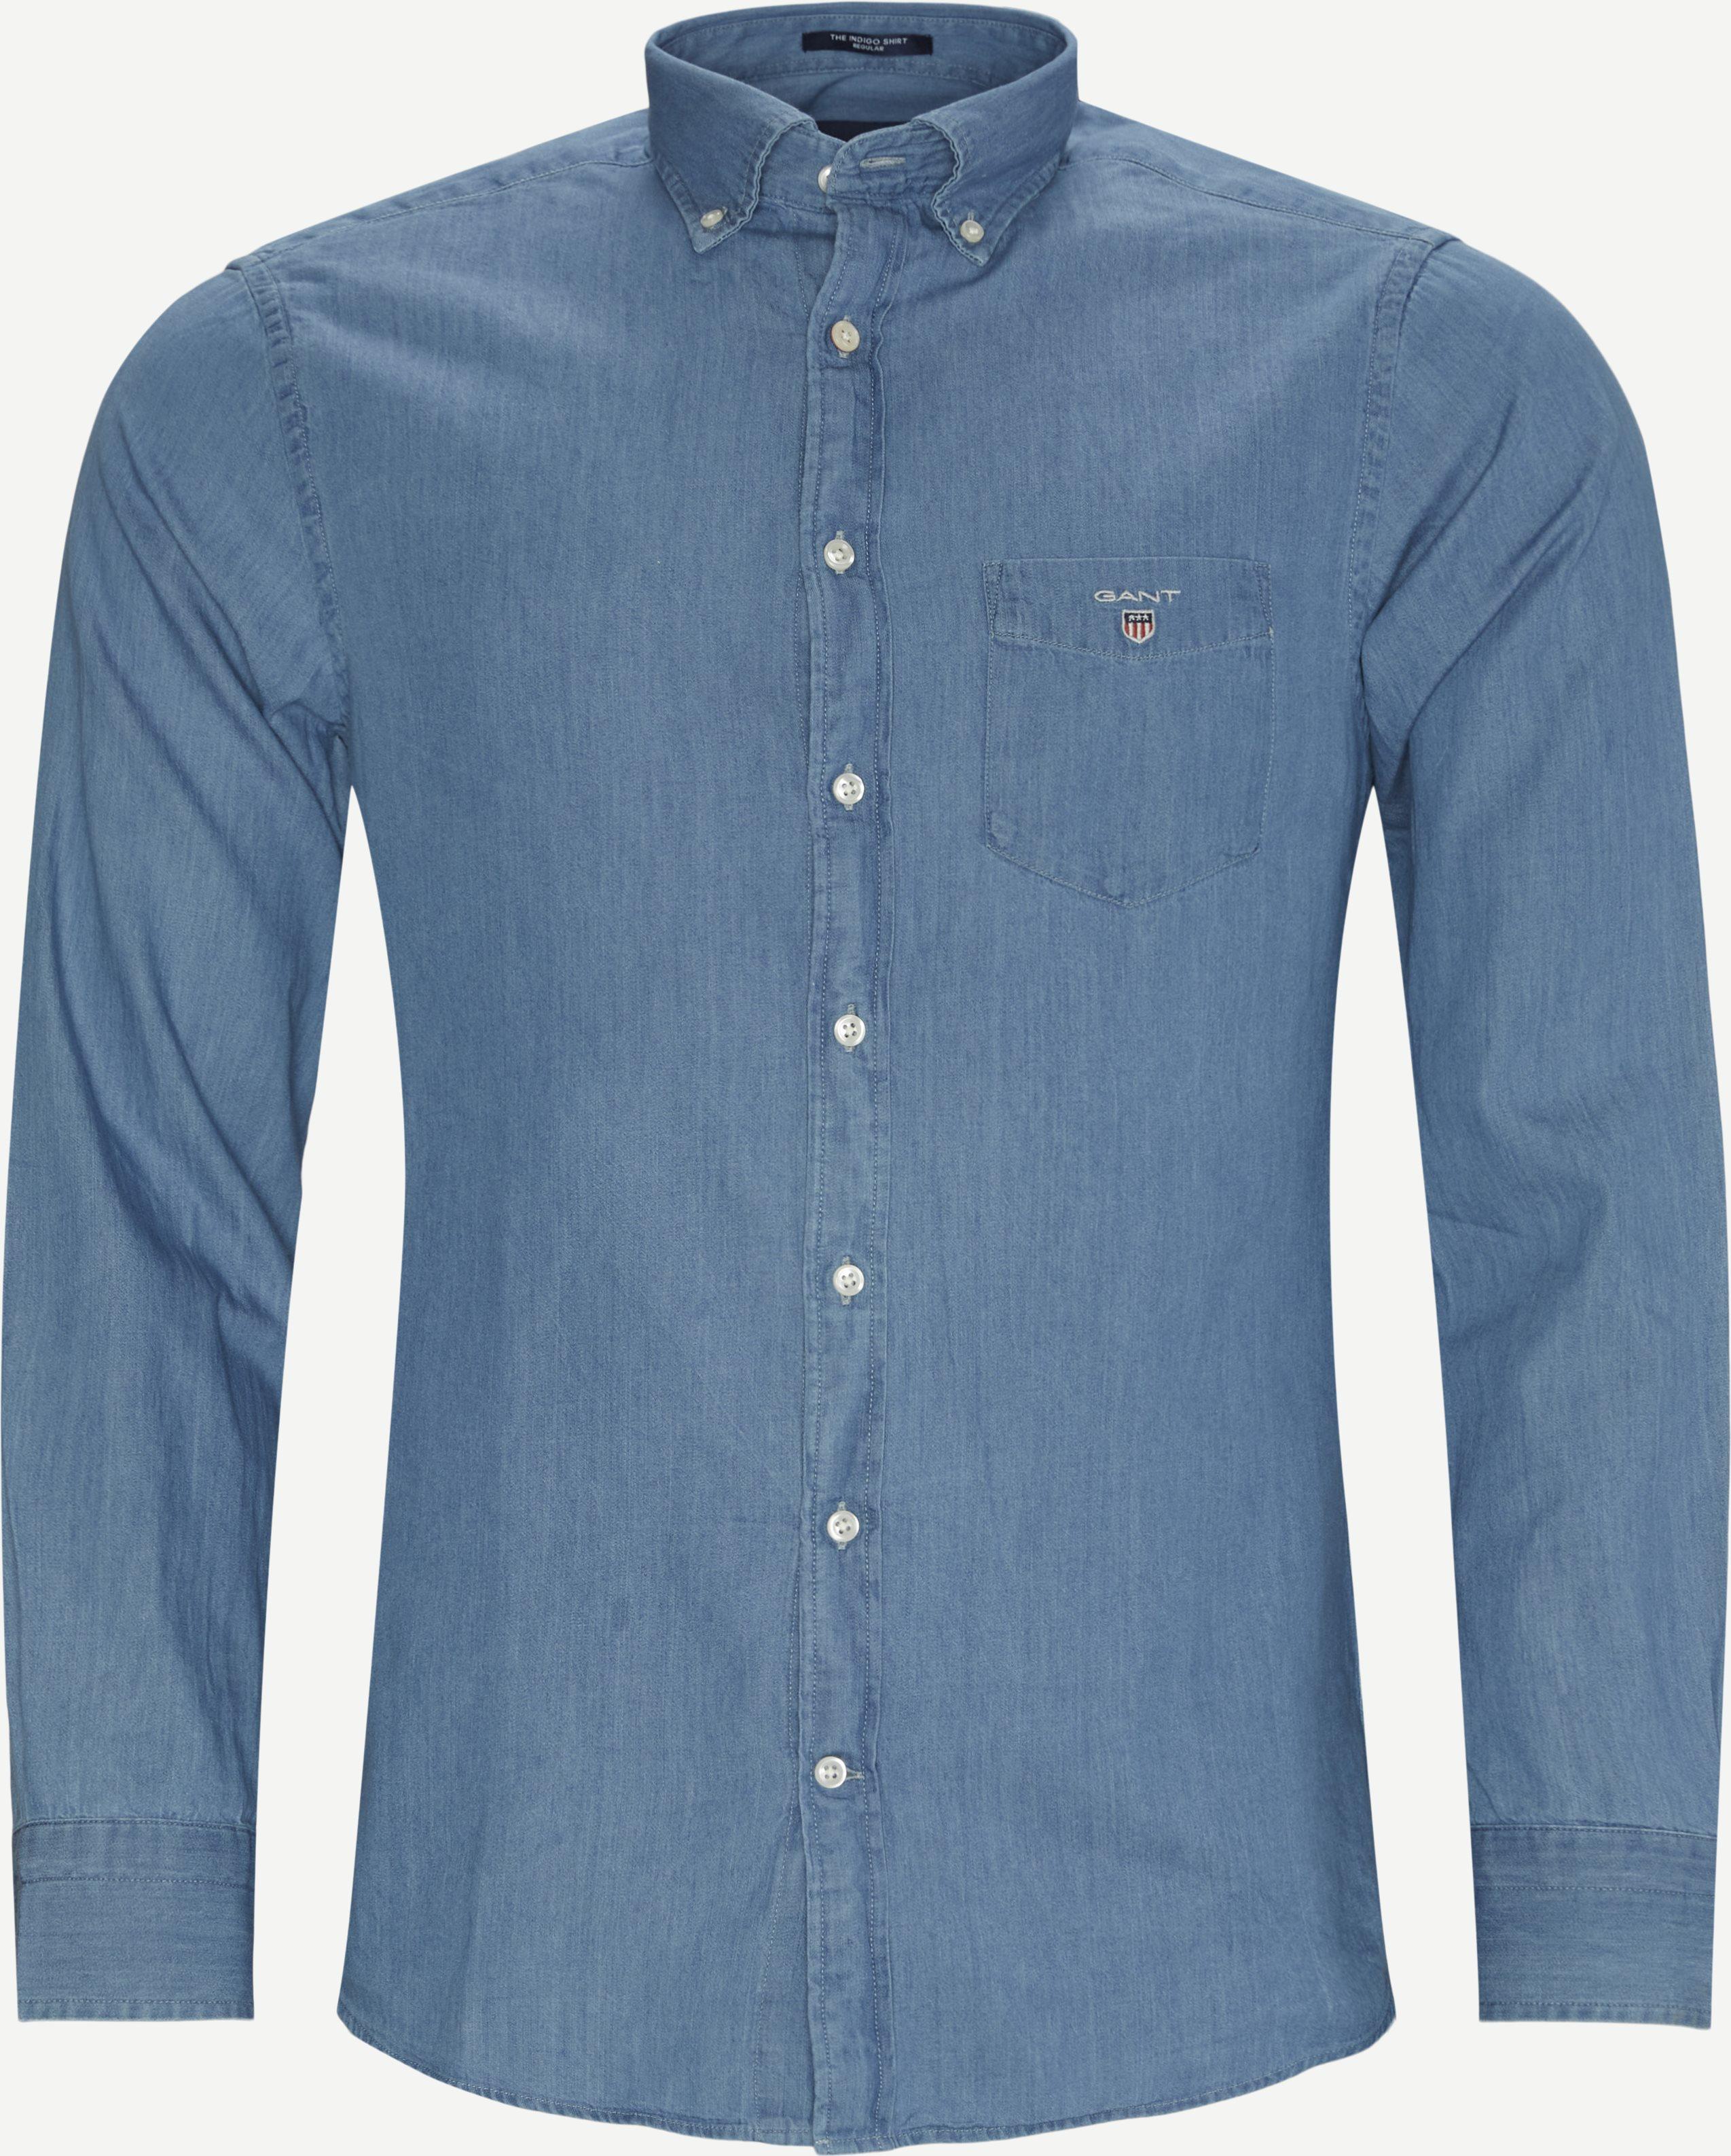 Reg Indigo Skjorte - Skjortor - Regular - Denim